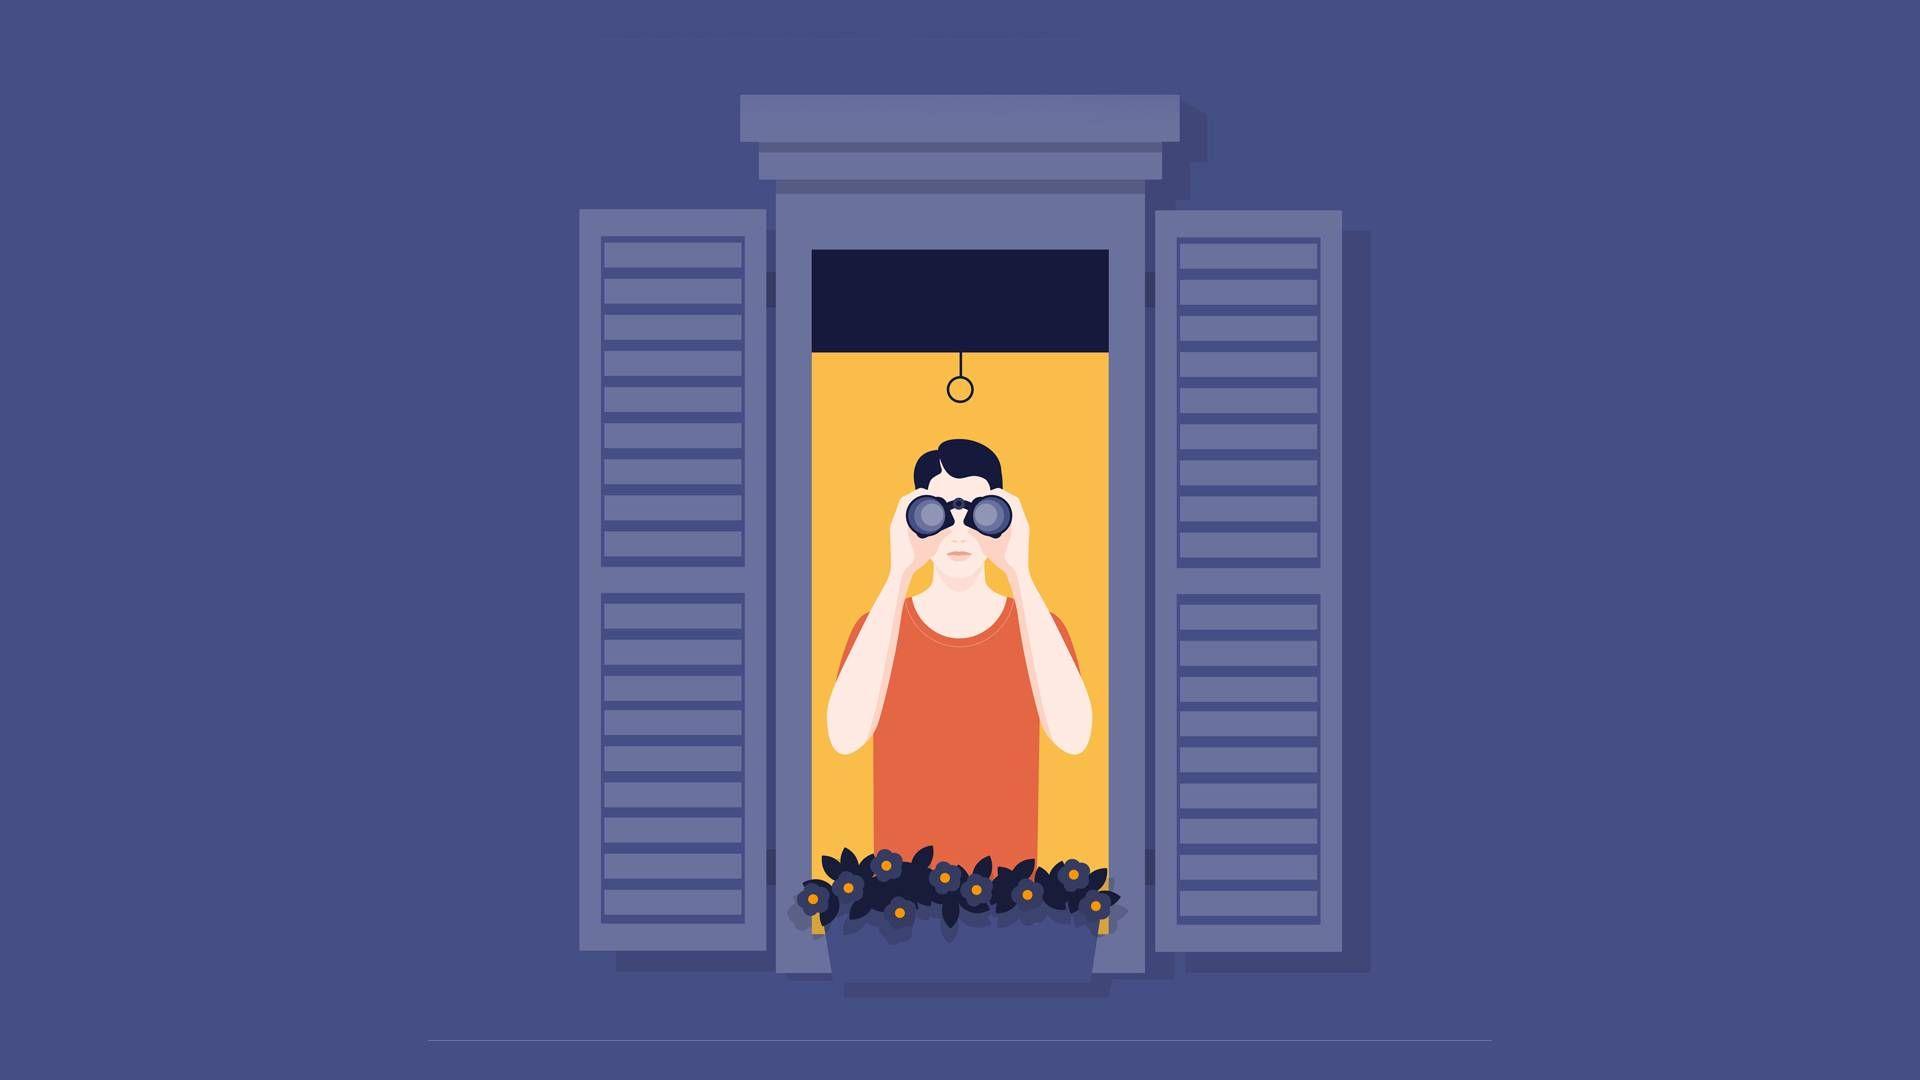 a man using binoculars to look out window. rewire pbs nextdoor and citizen app